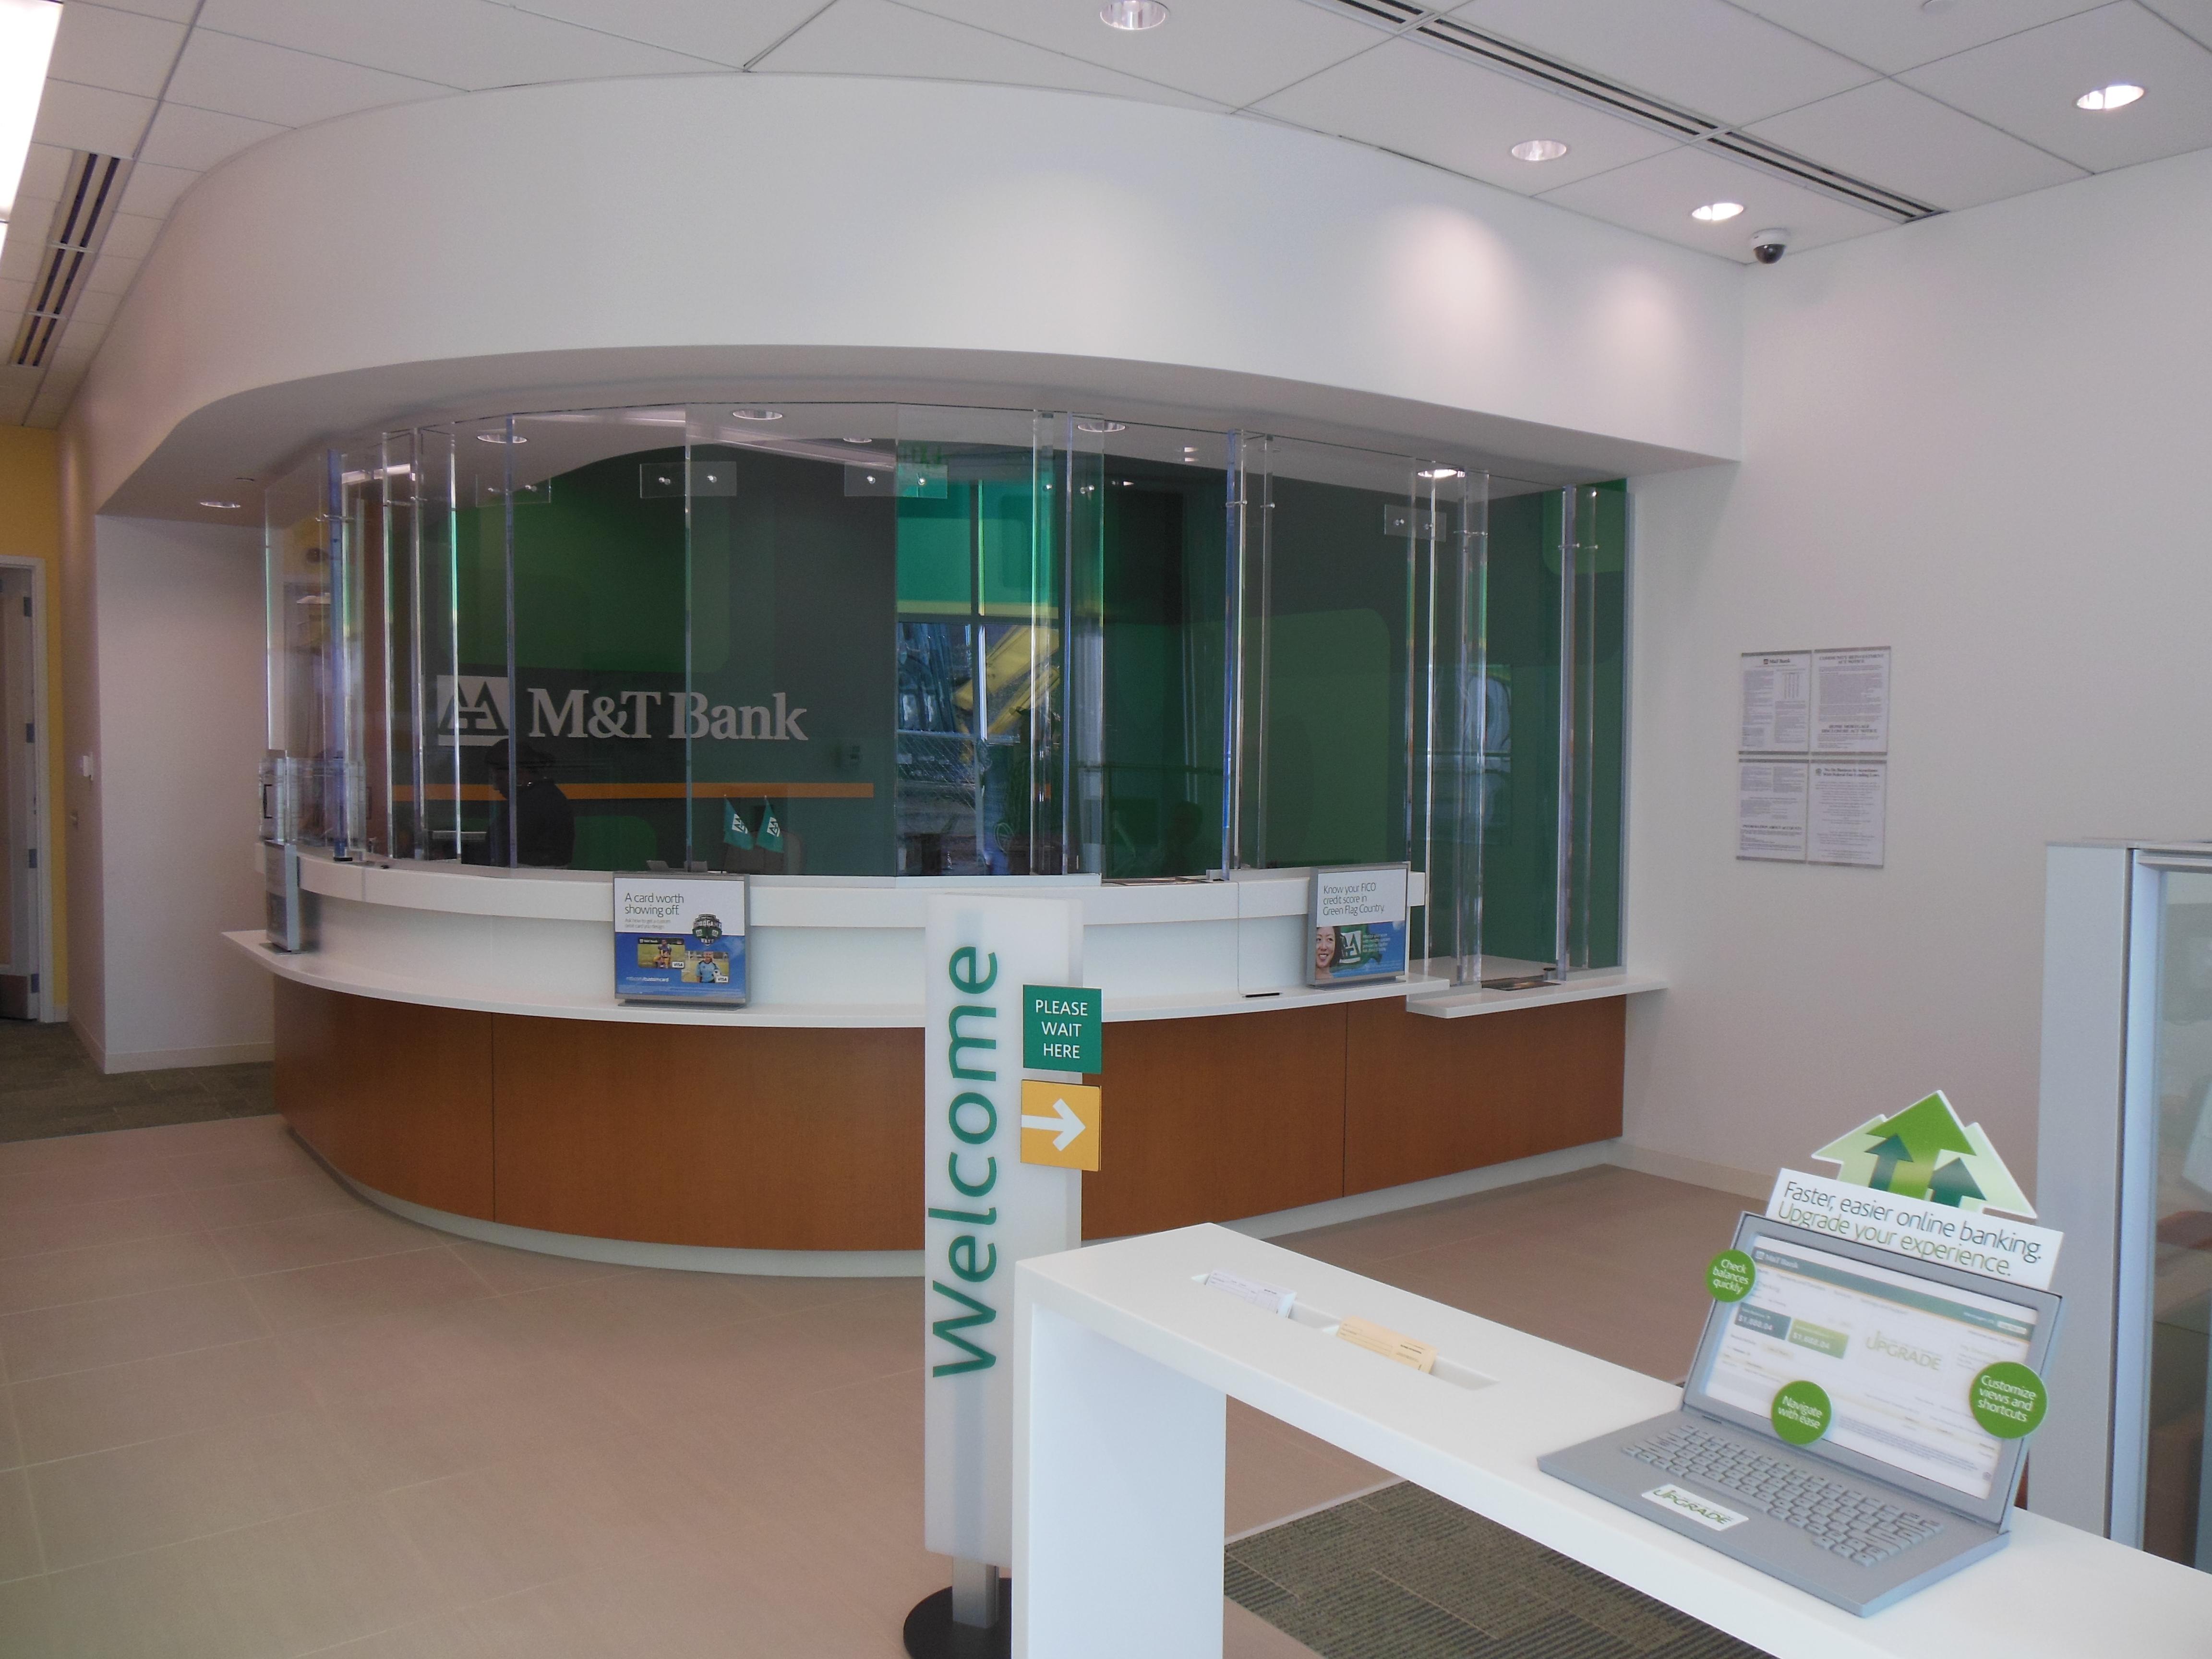 New M&T Bank Branch Opens at 400 East Pratt Street